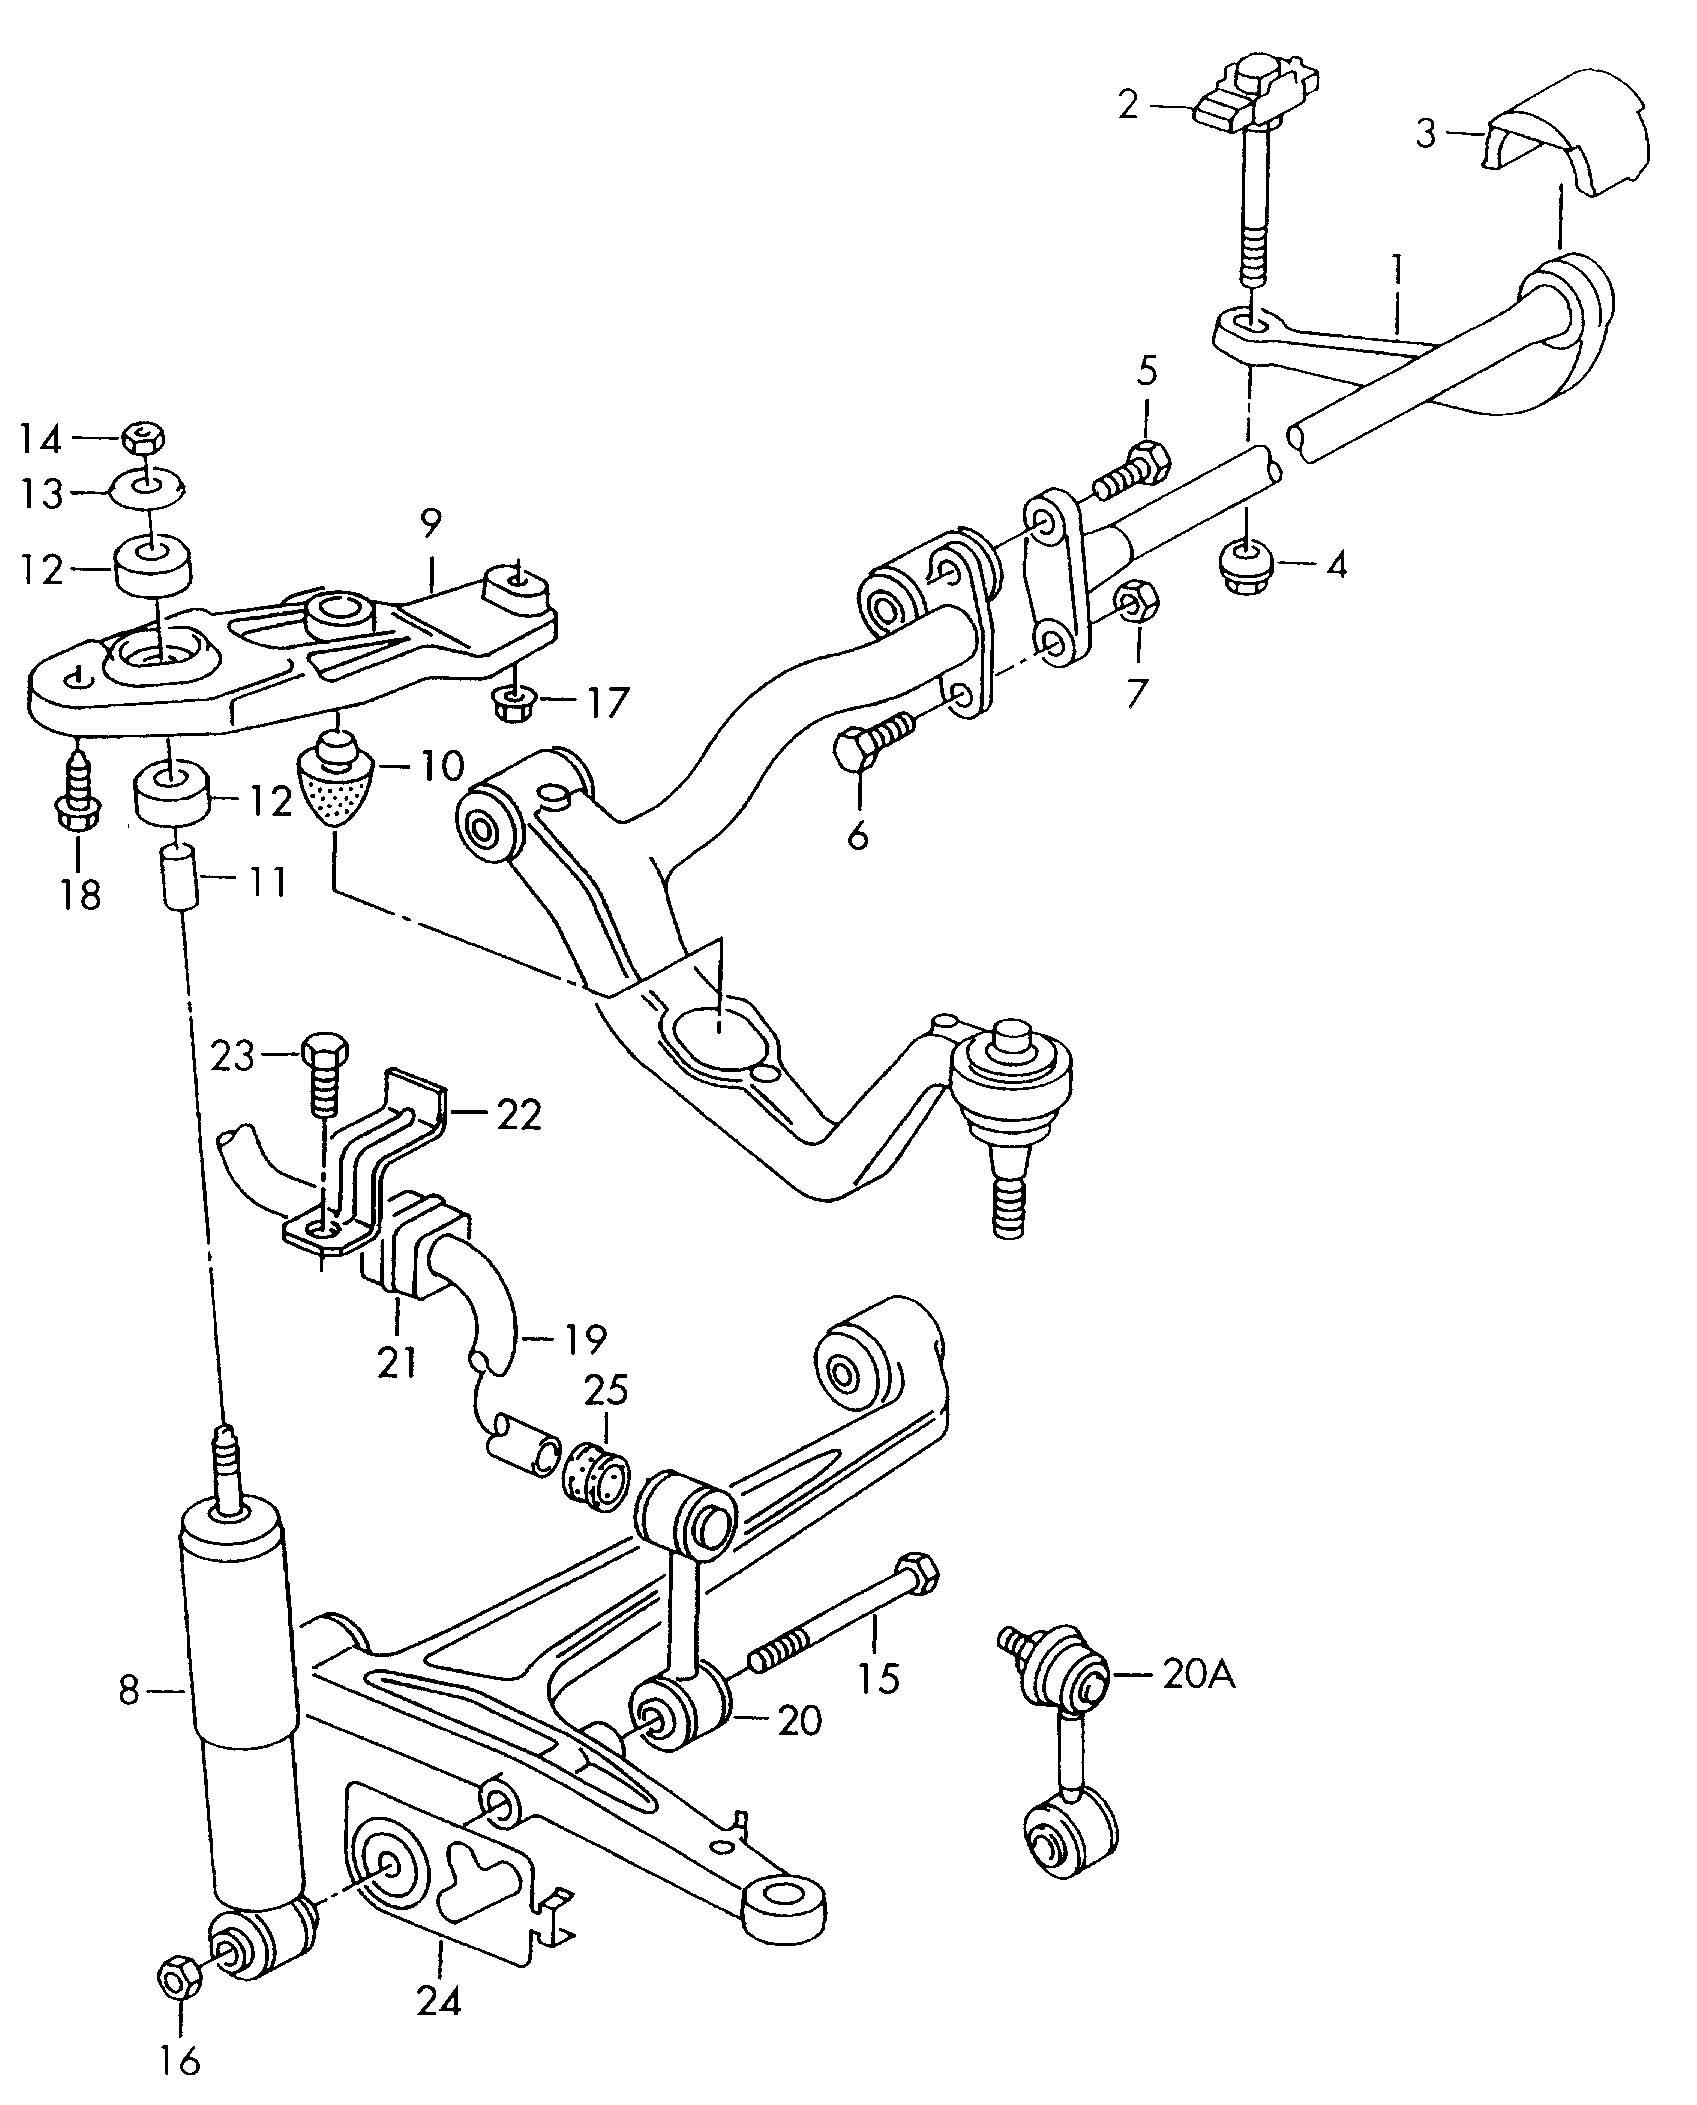 vw eos parts diagram cat6 wiring 2000 jaguar xjr fuse toyota